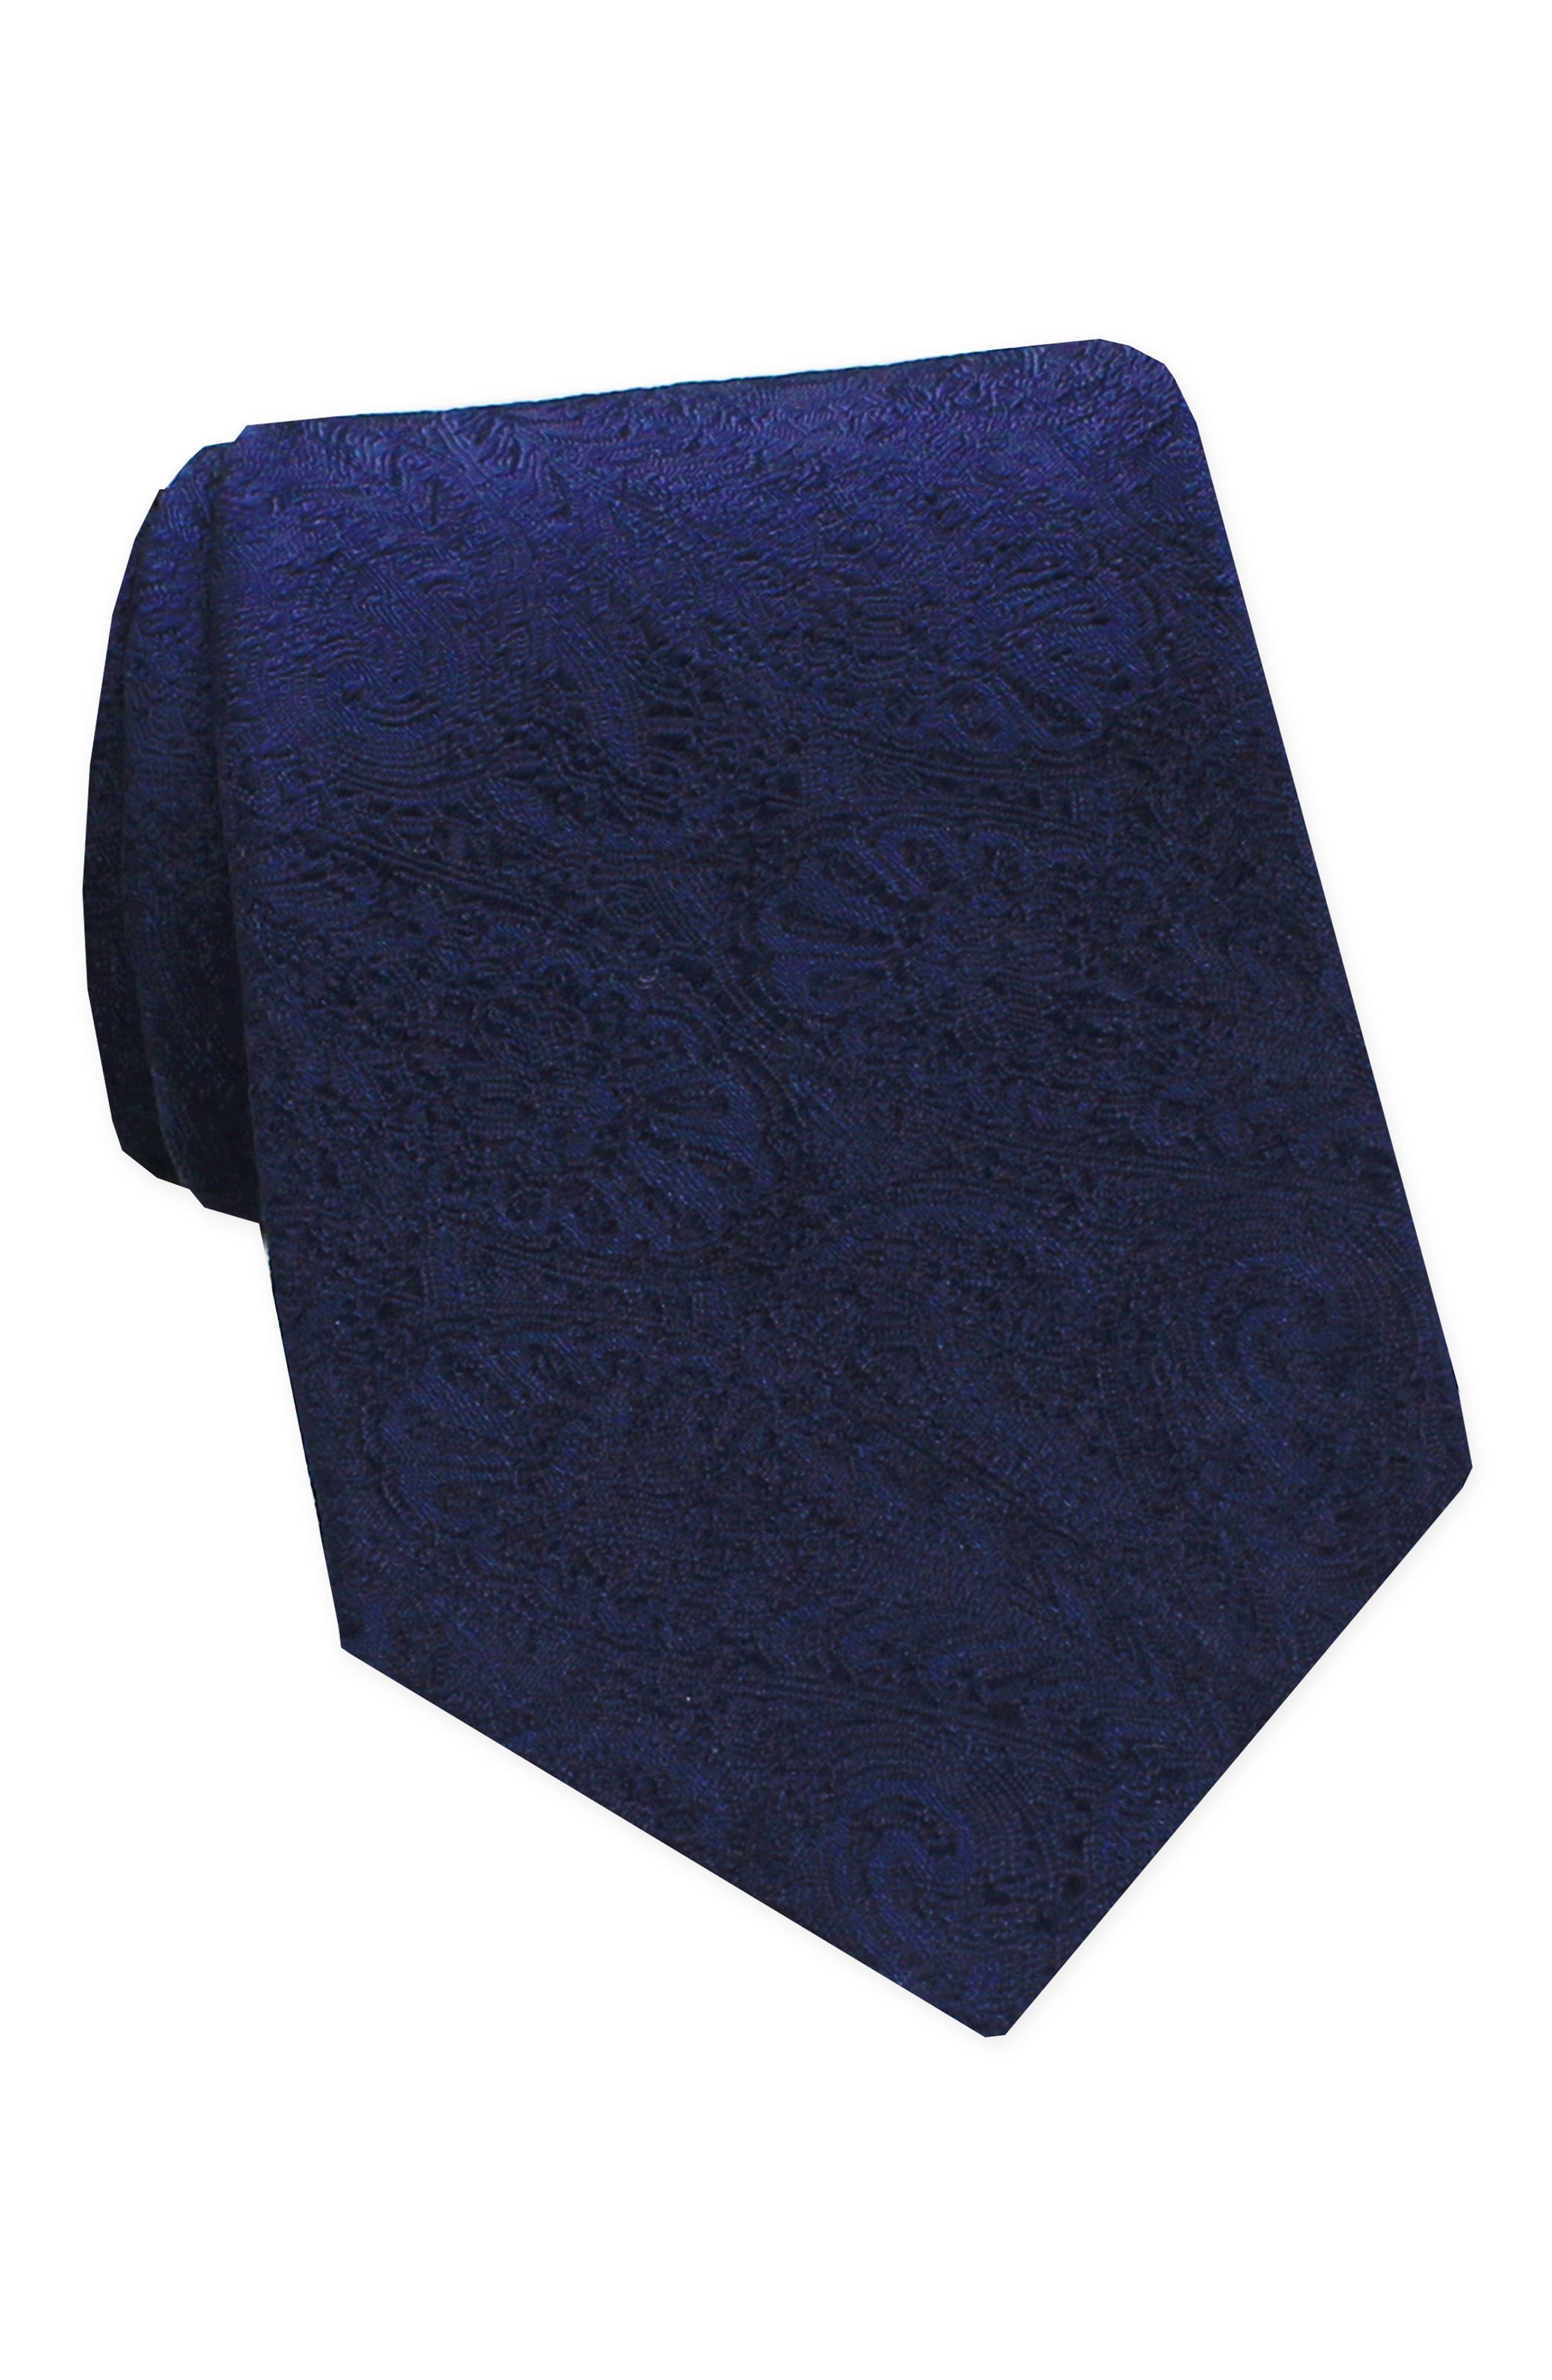 Alternate Image 1 Selected - Gitman Paisley Silk Tie